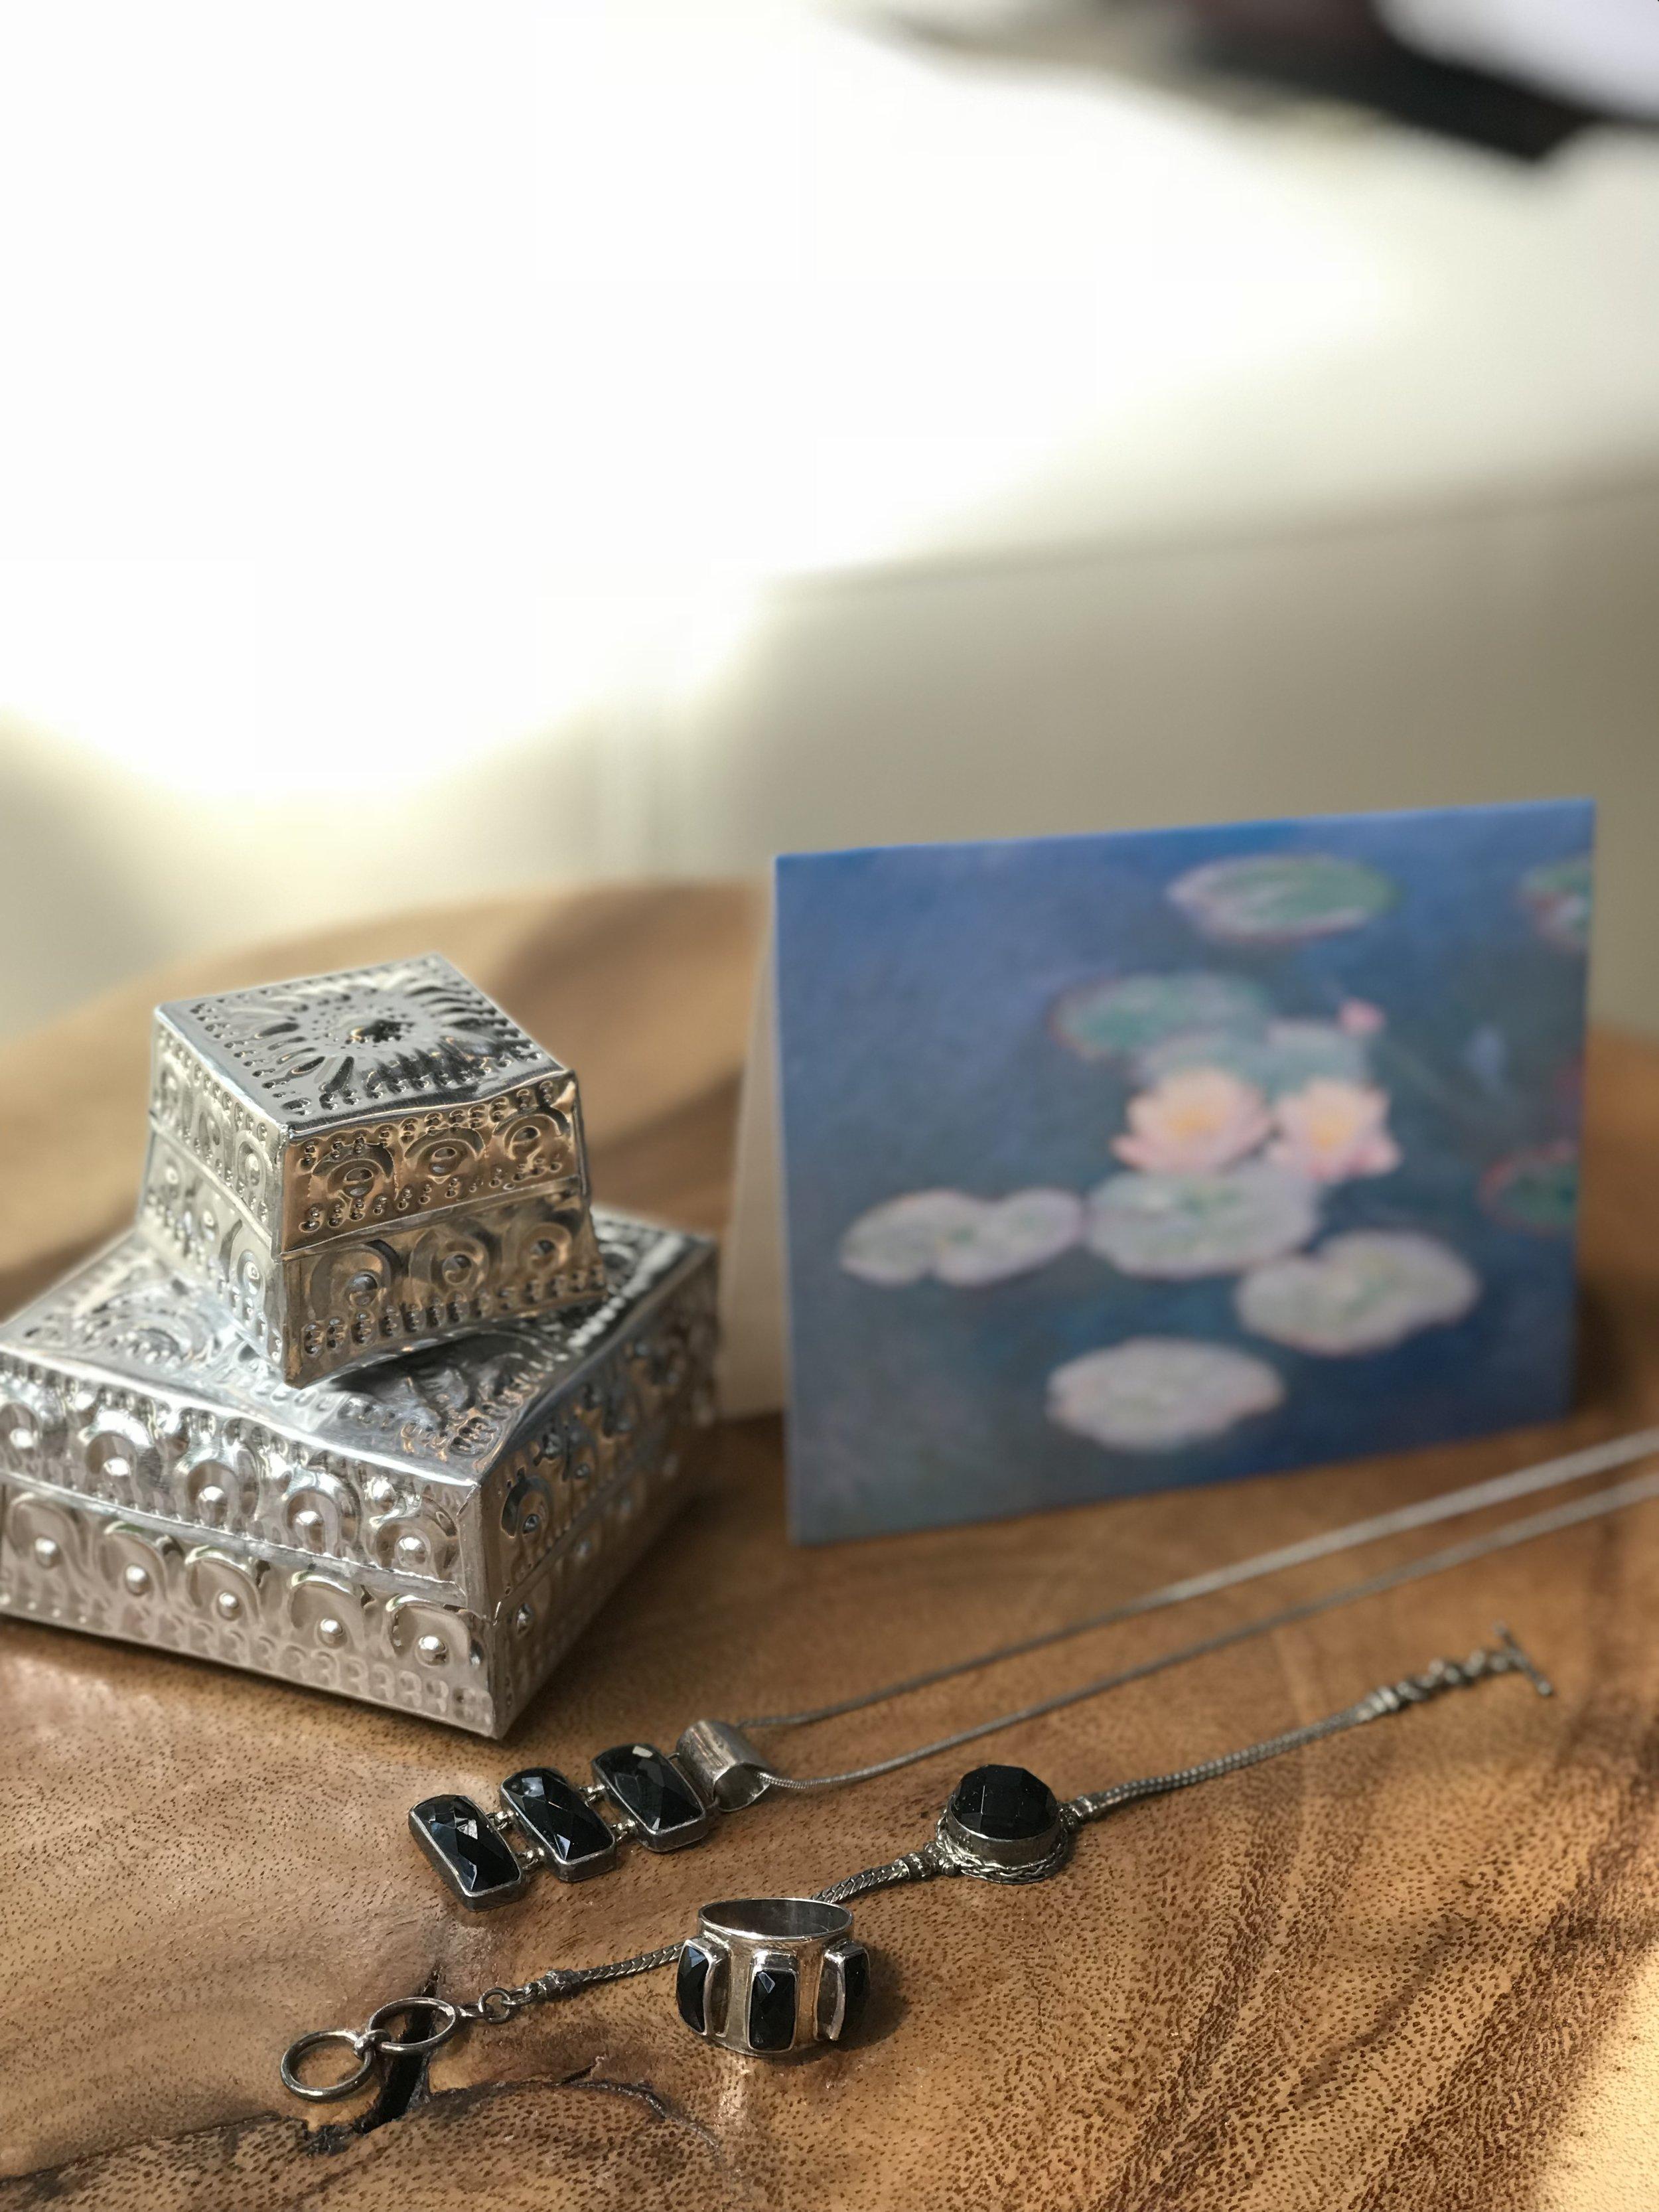 winnipeg furniture store. Onyx jewelry. Mother's Day gift guide.JPG